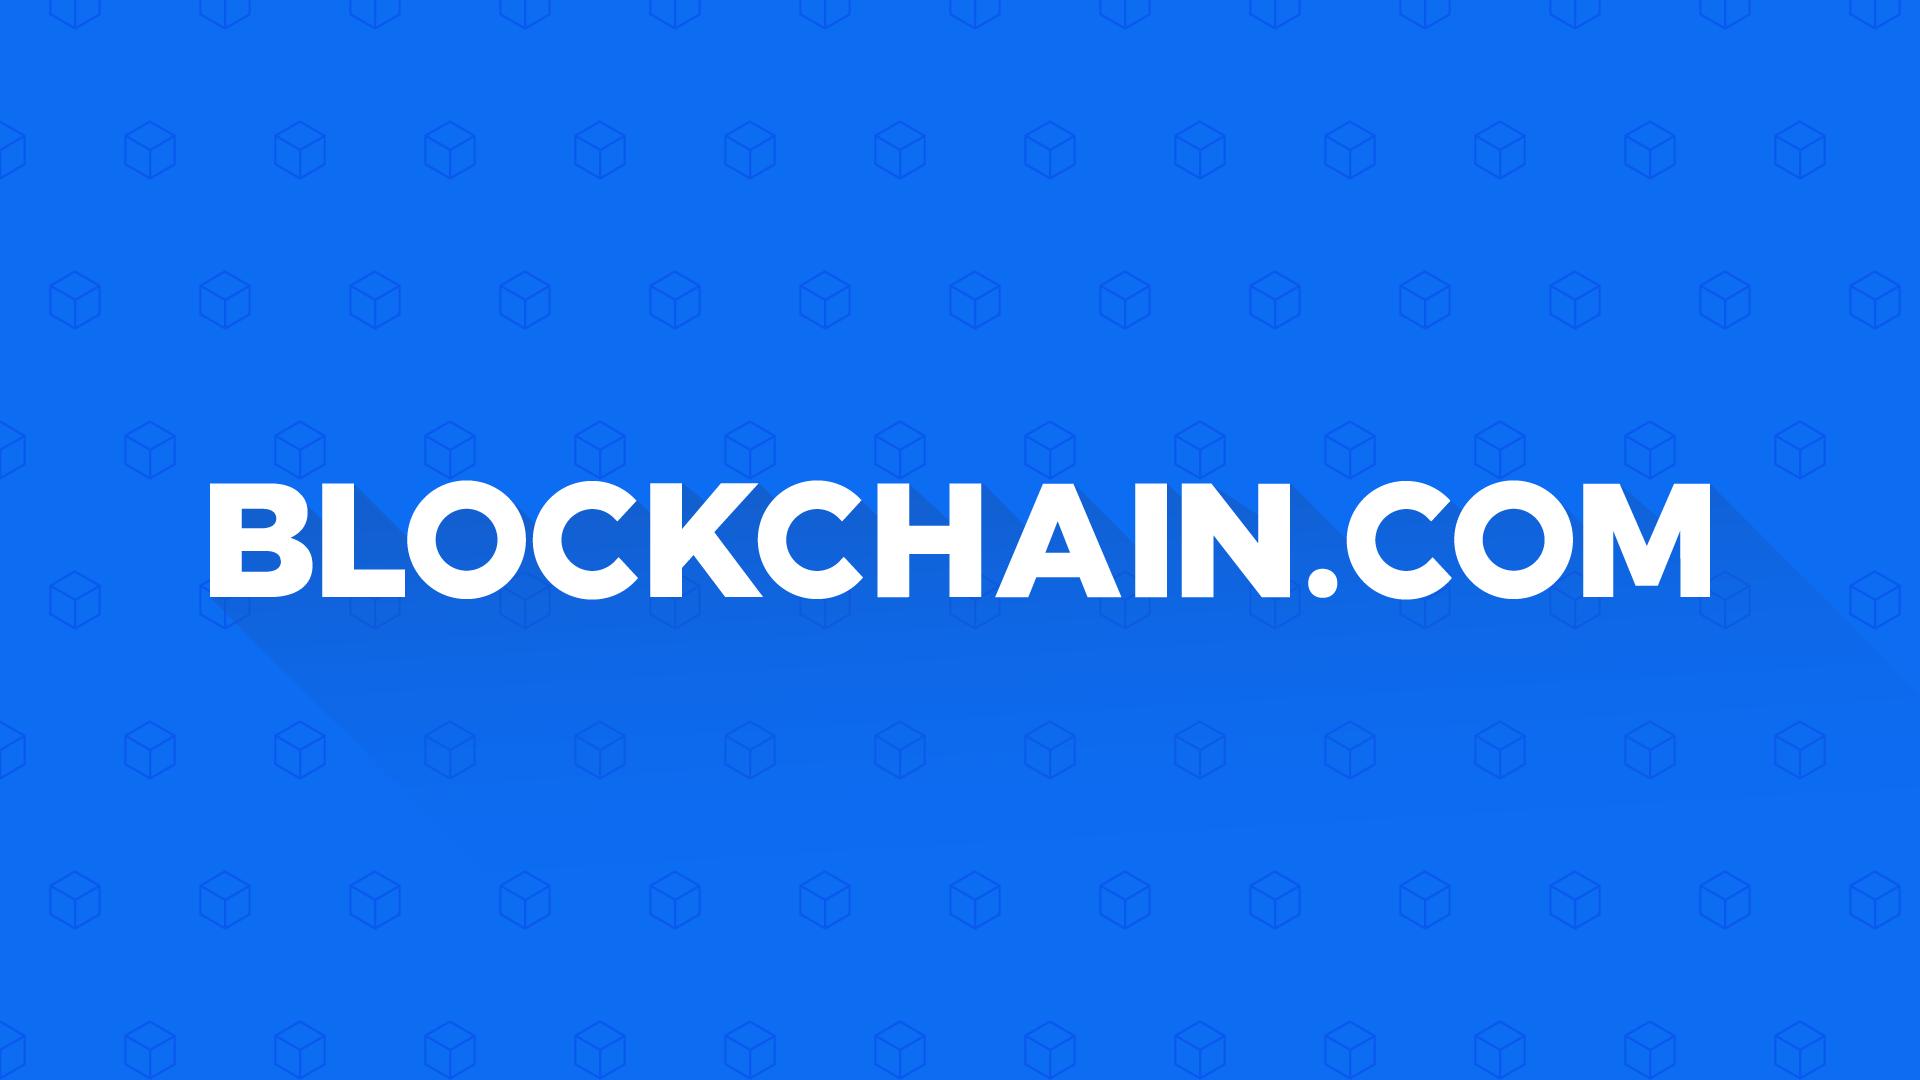 биржа blockhain.com